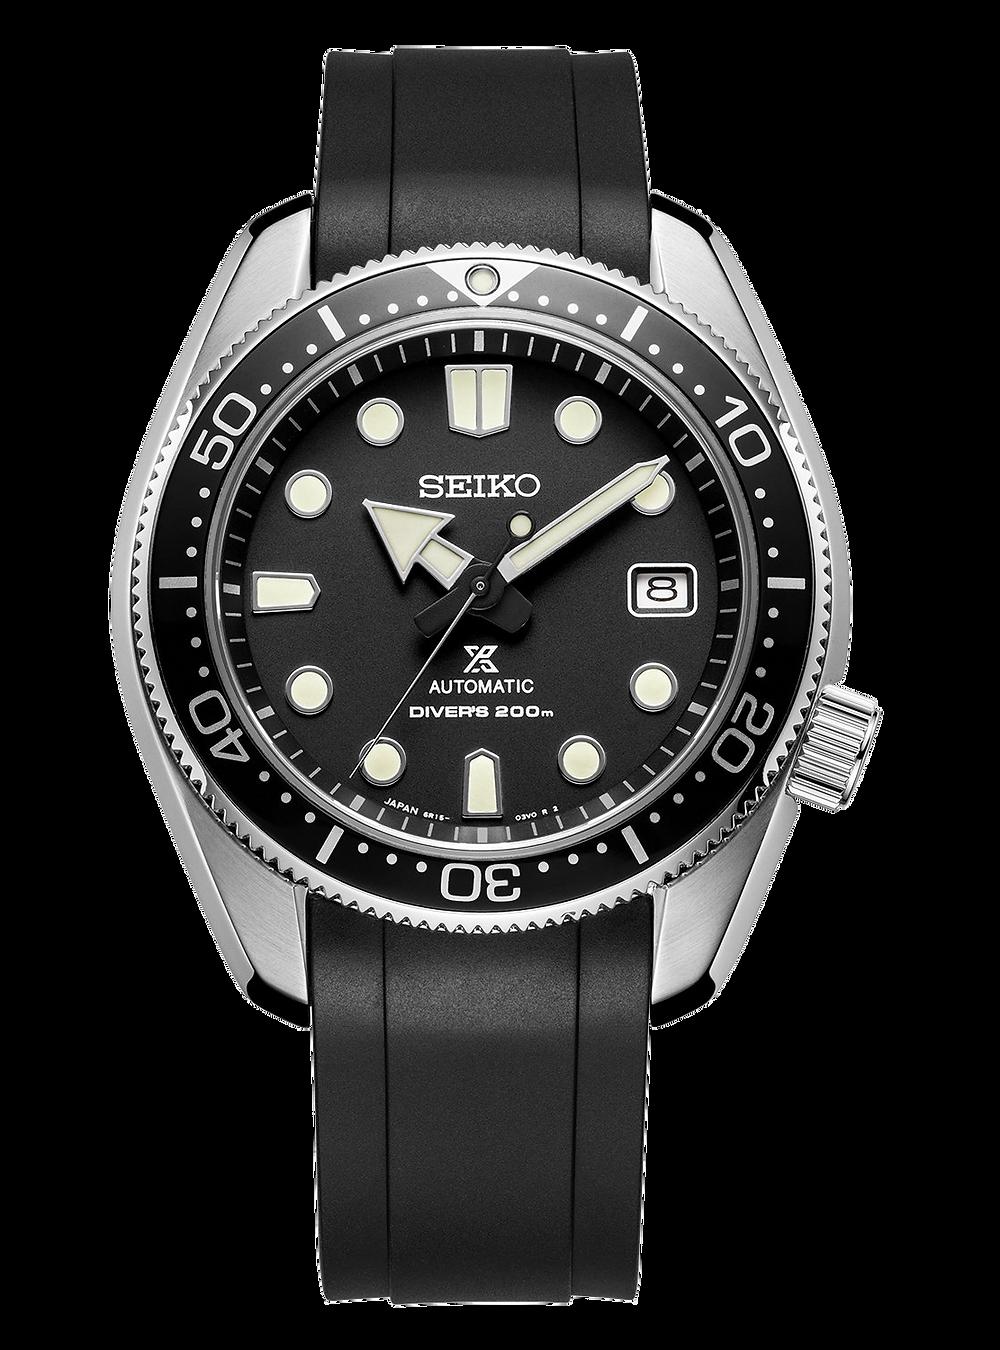 Reloj Seiko SPB077 con correa Crafter blue CB13 ajustada a caja